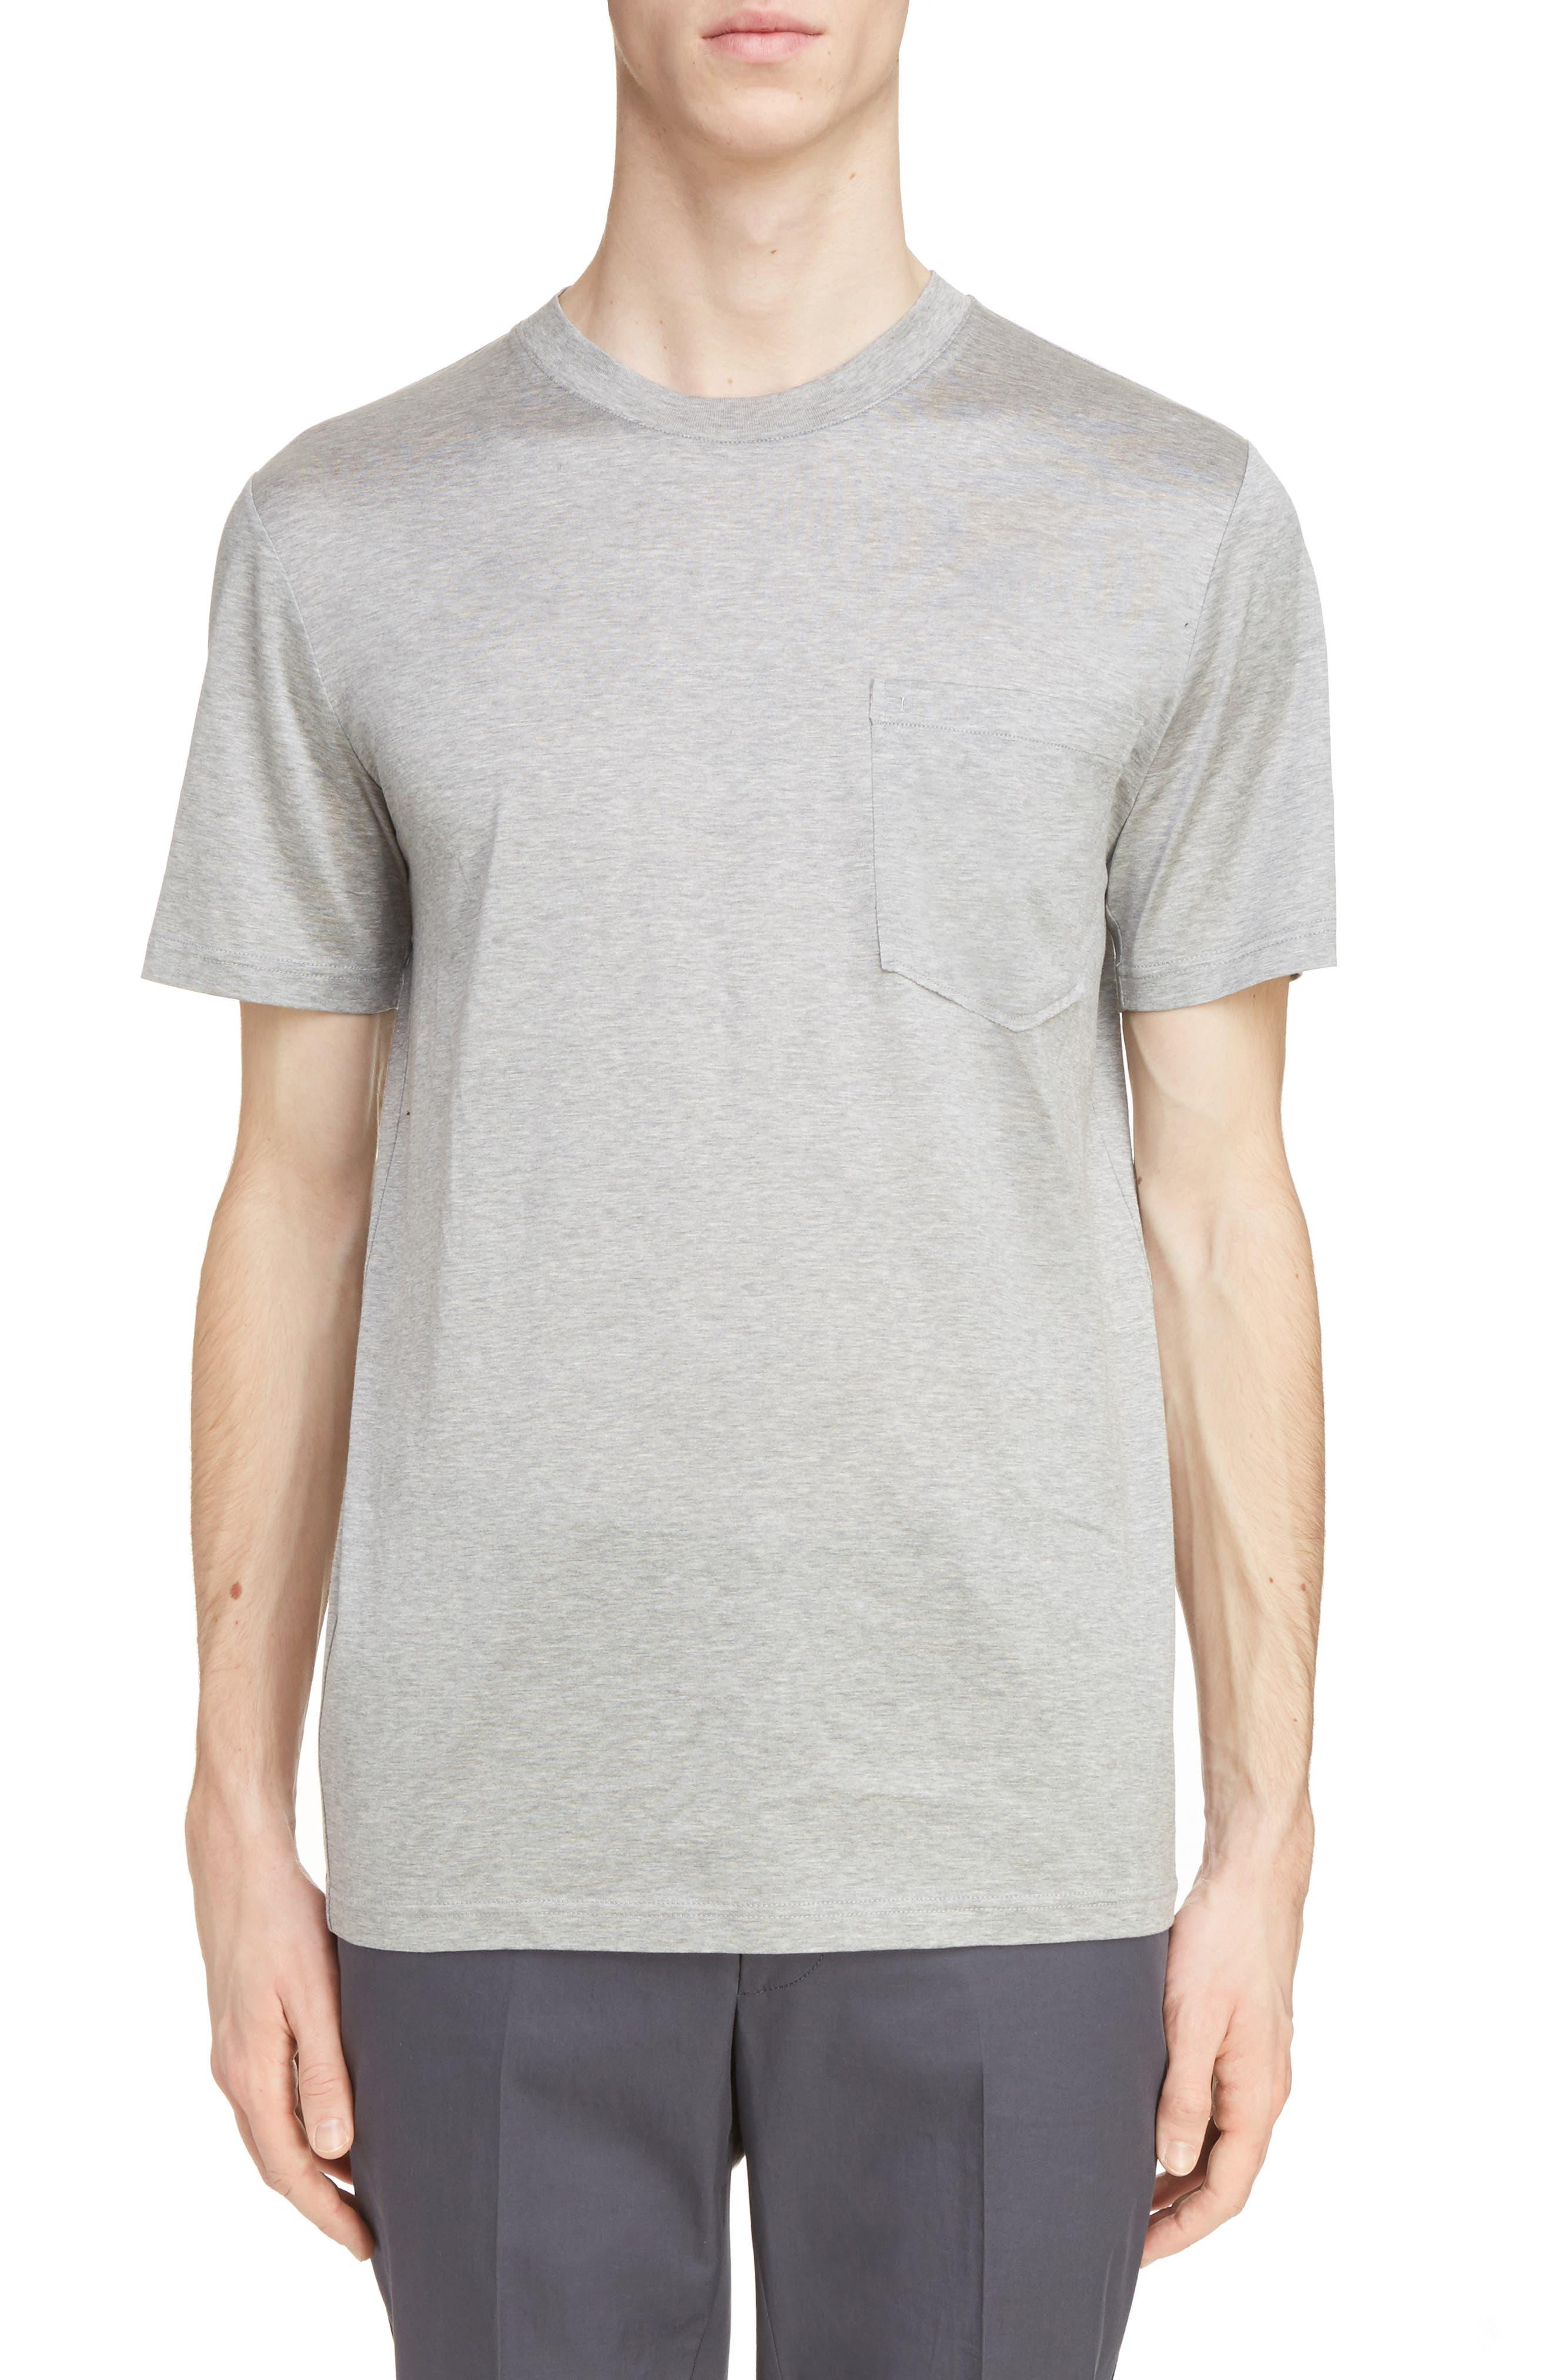 Lanvin L Pocket T-Shirt